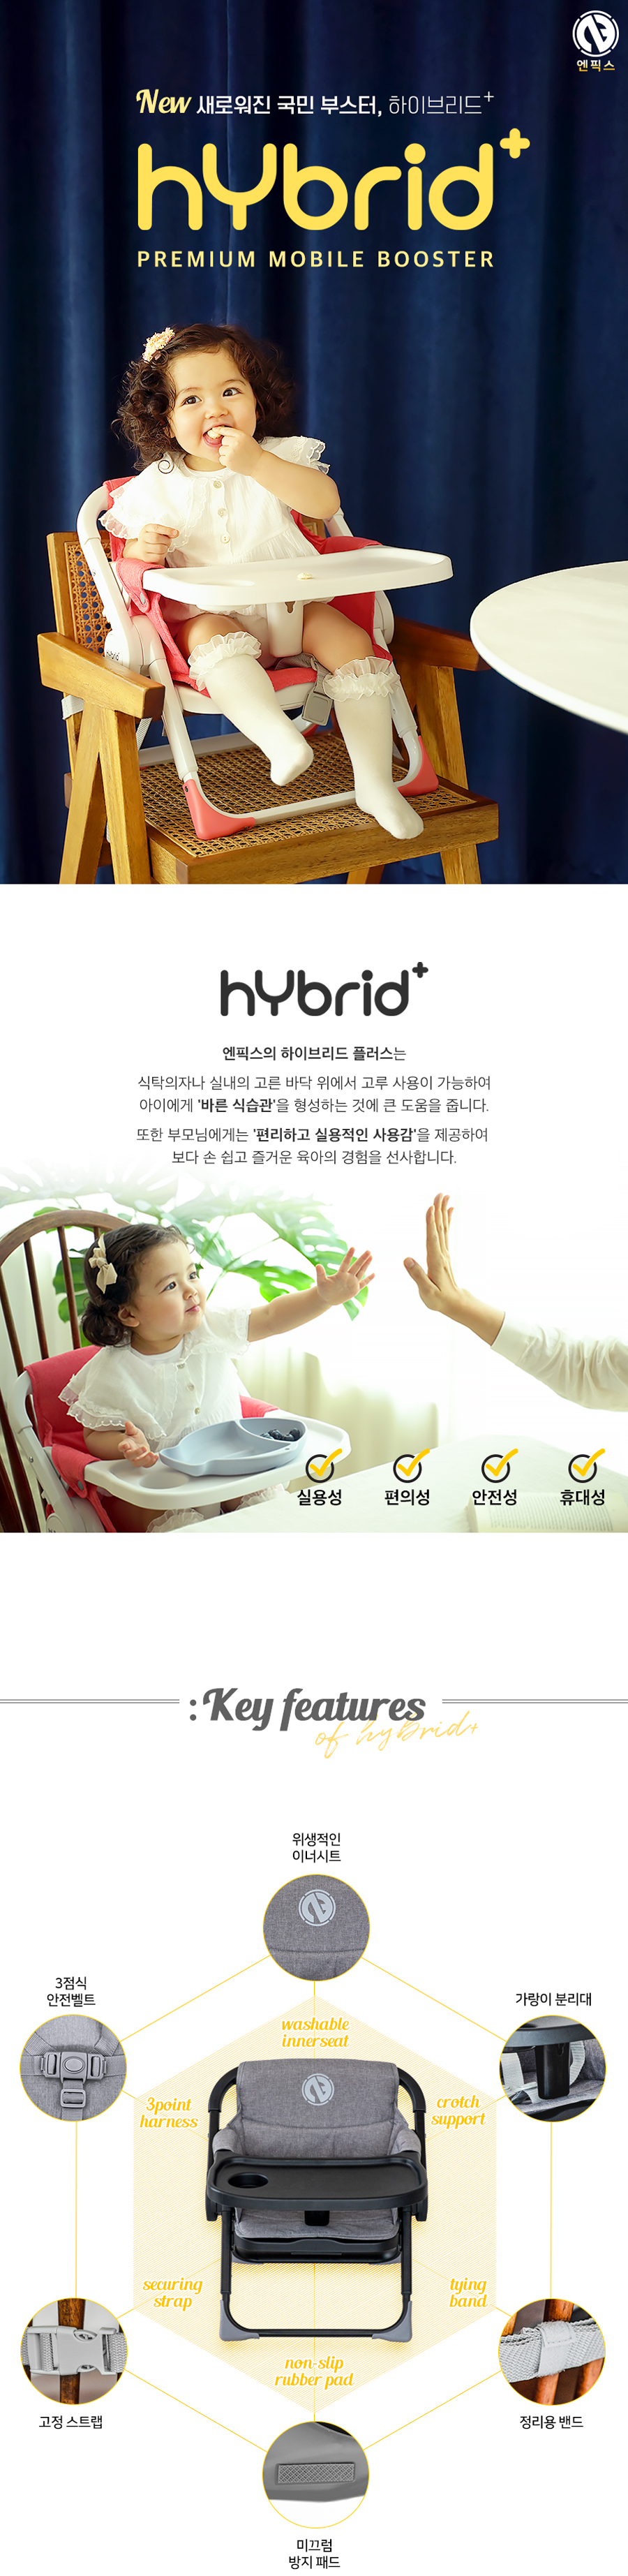 hybridplus_fin_1.jpg